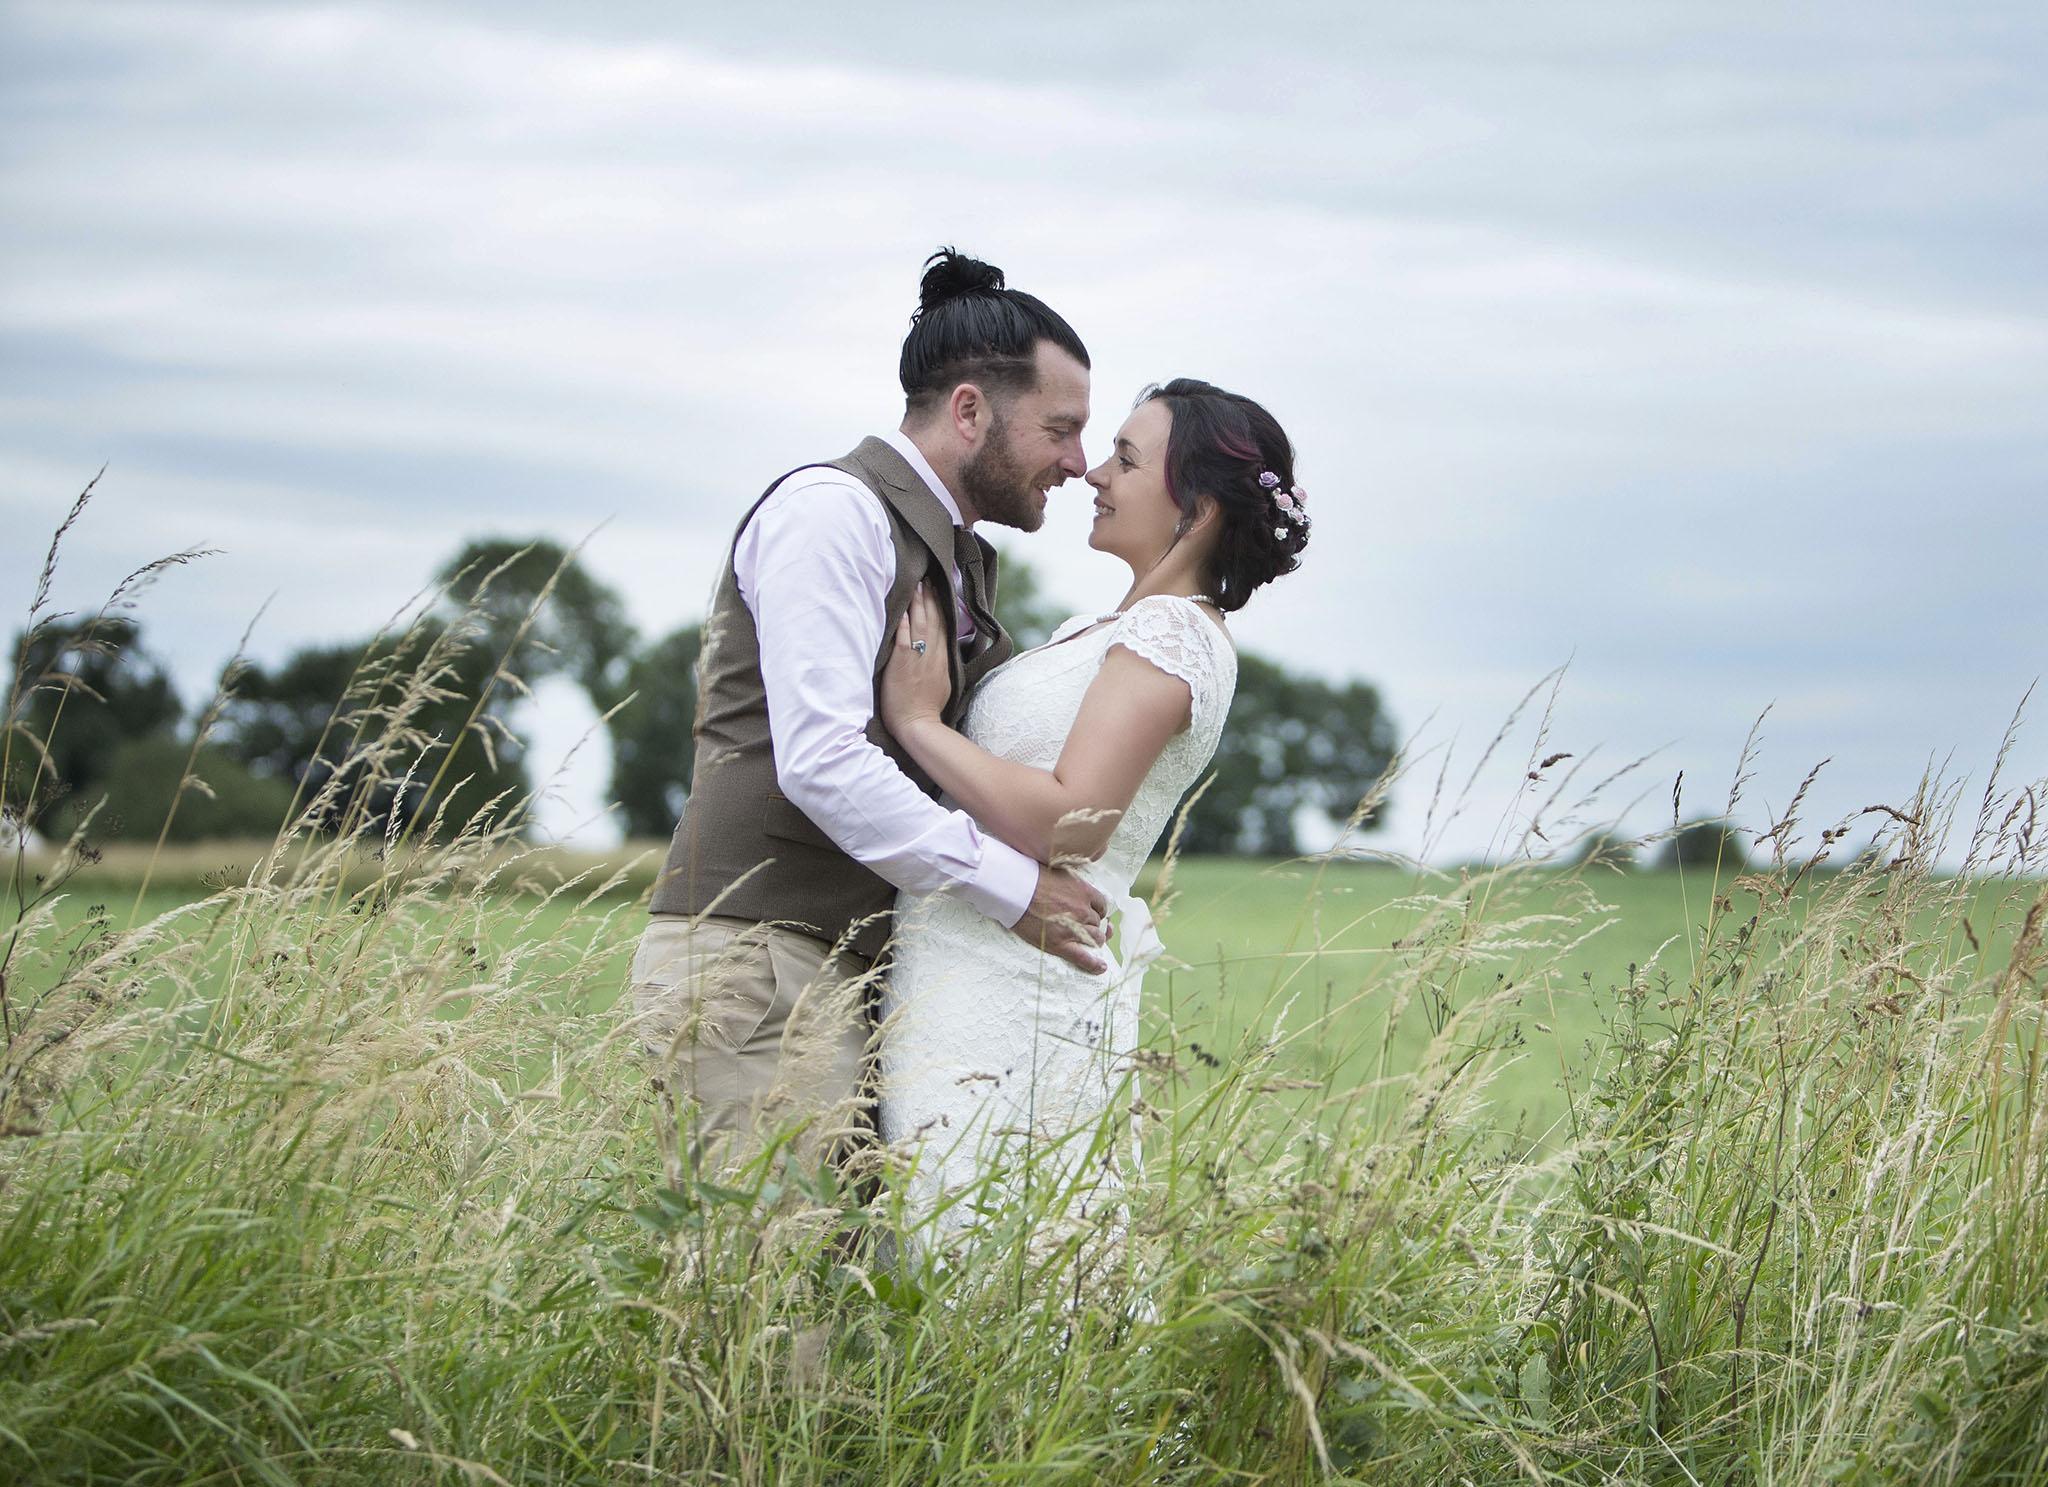 elizabethgphotography_kingslangley_hertfordshire_fineart_wedding_photography_lincolnshire_anna_simon_09.jpg